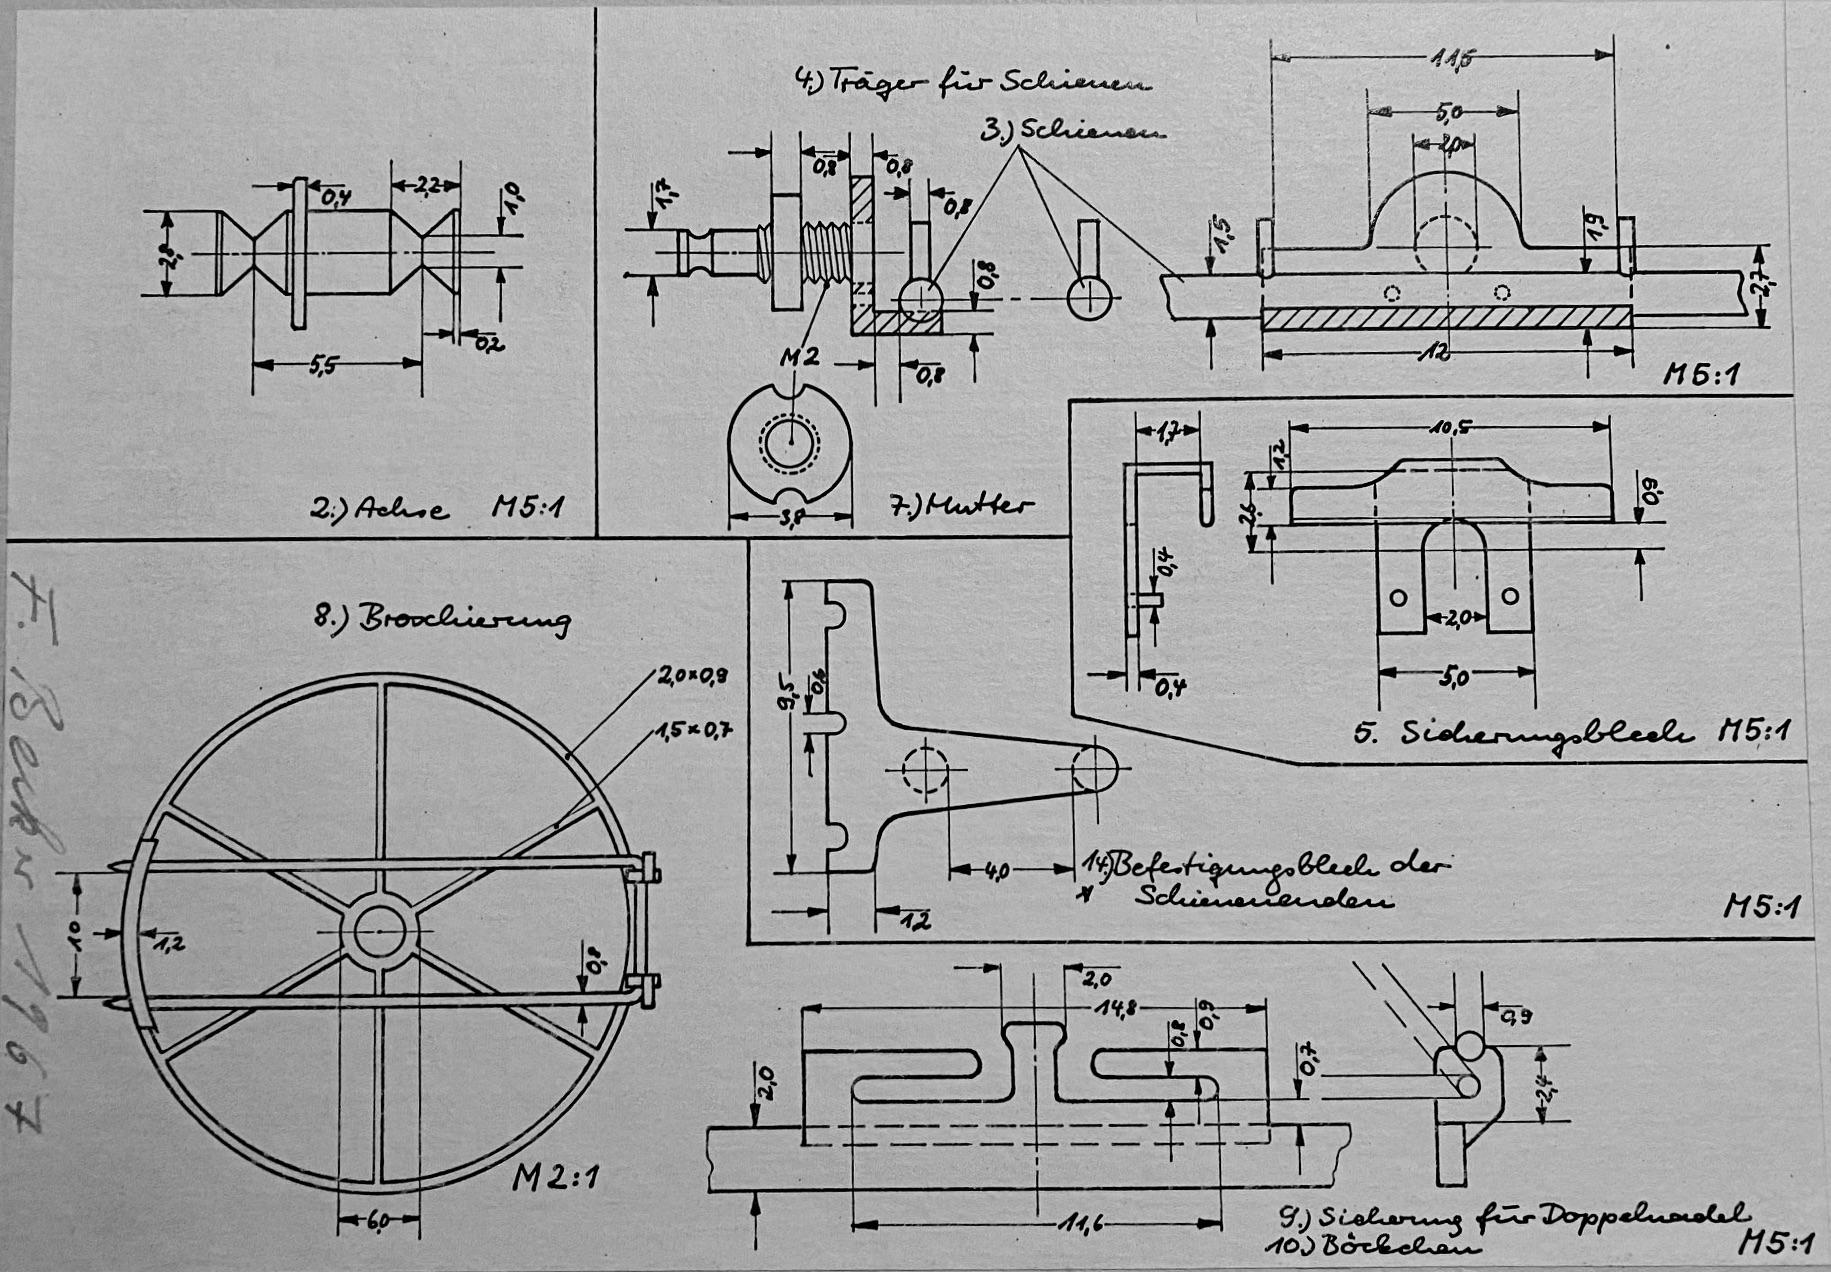 Friedrich Becker, tekening broche, 1967. Collectie Boelen